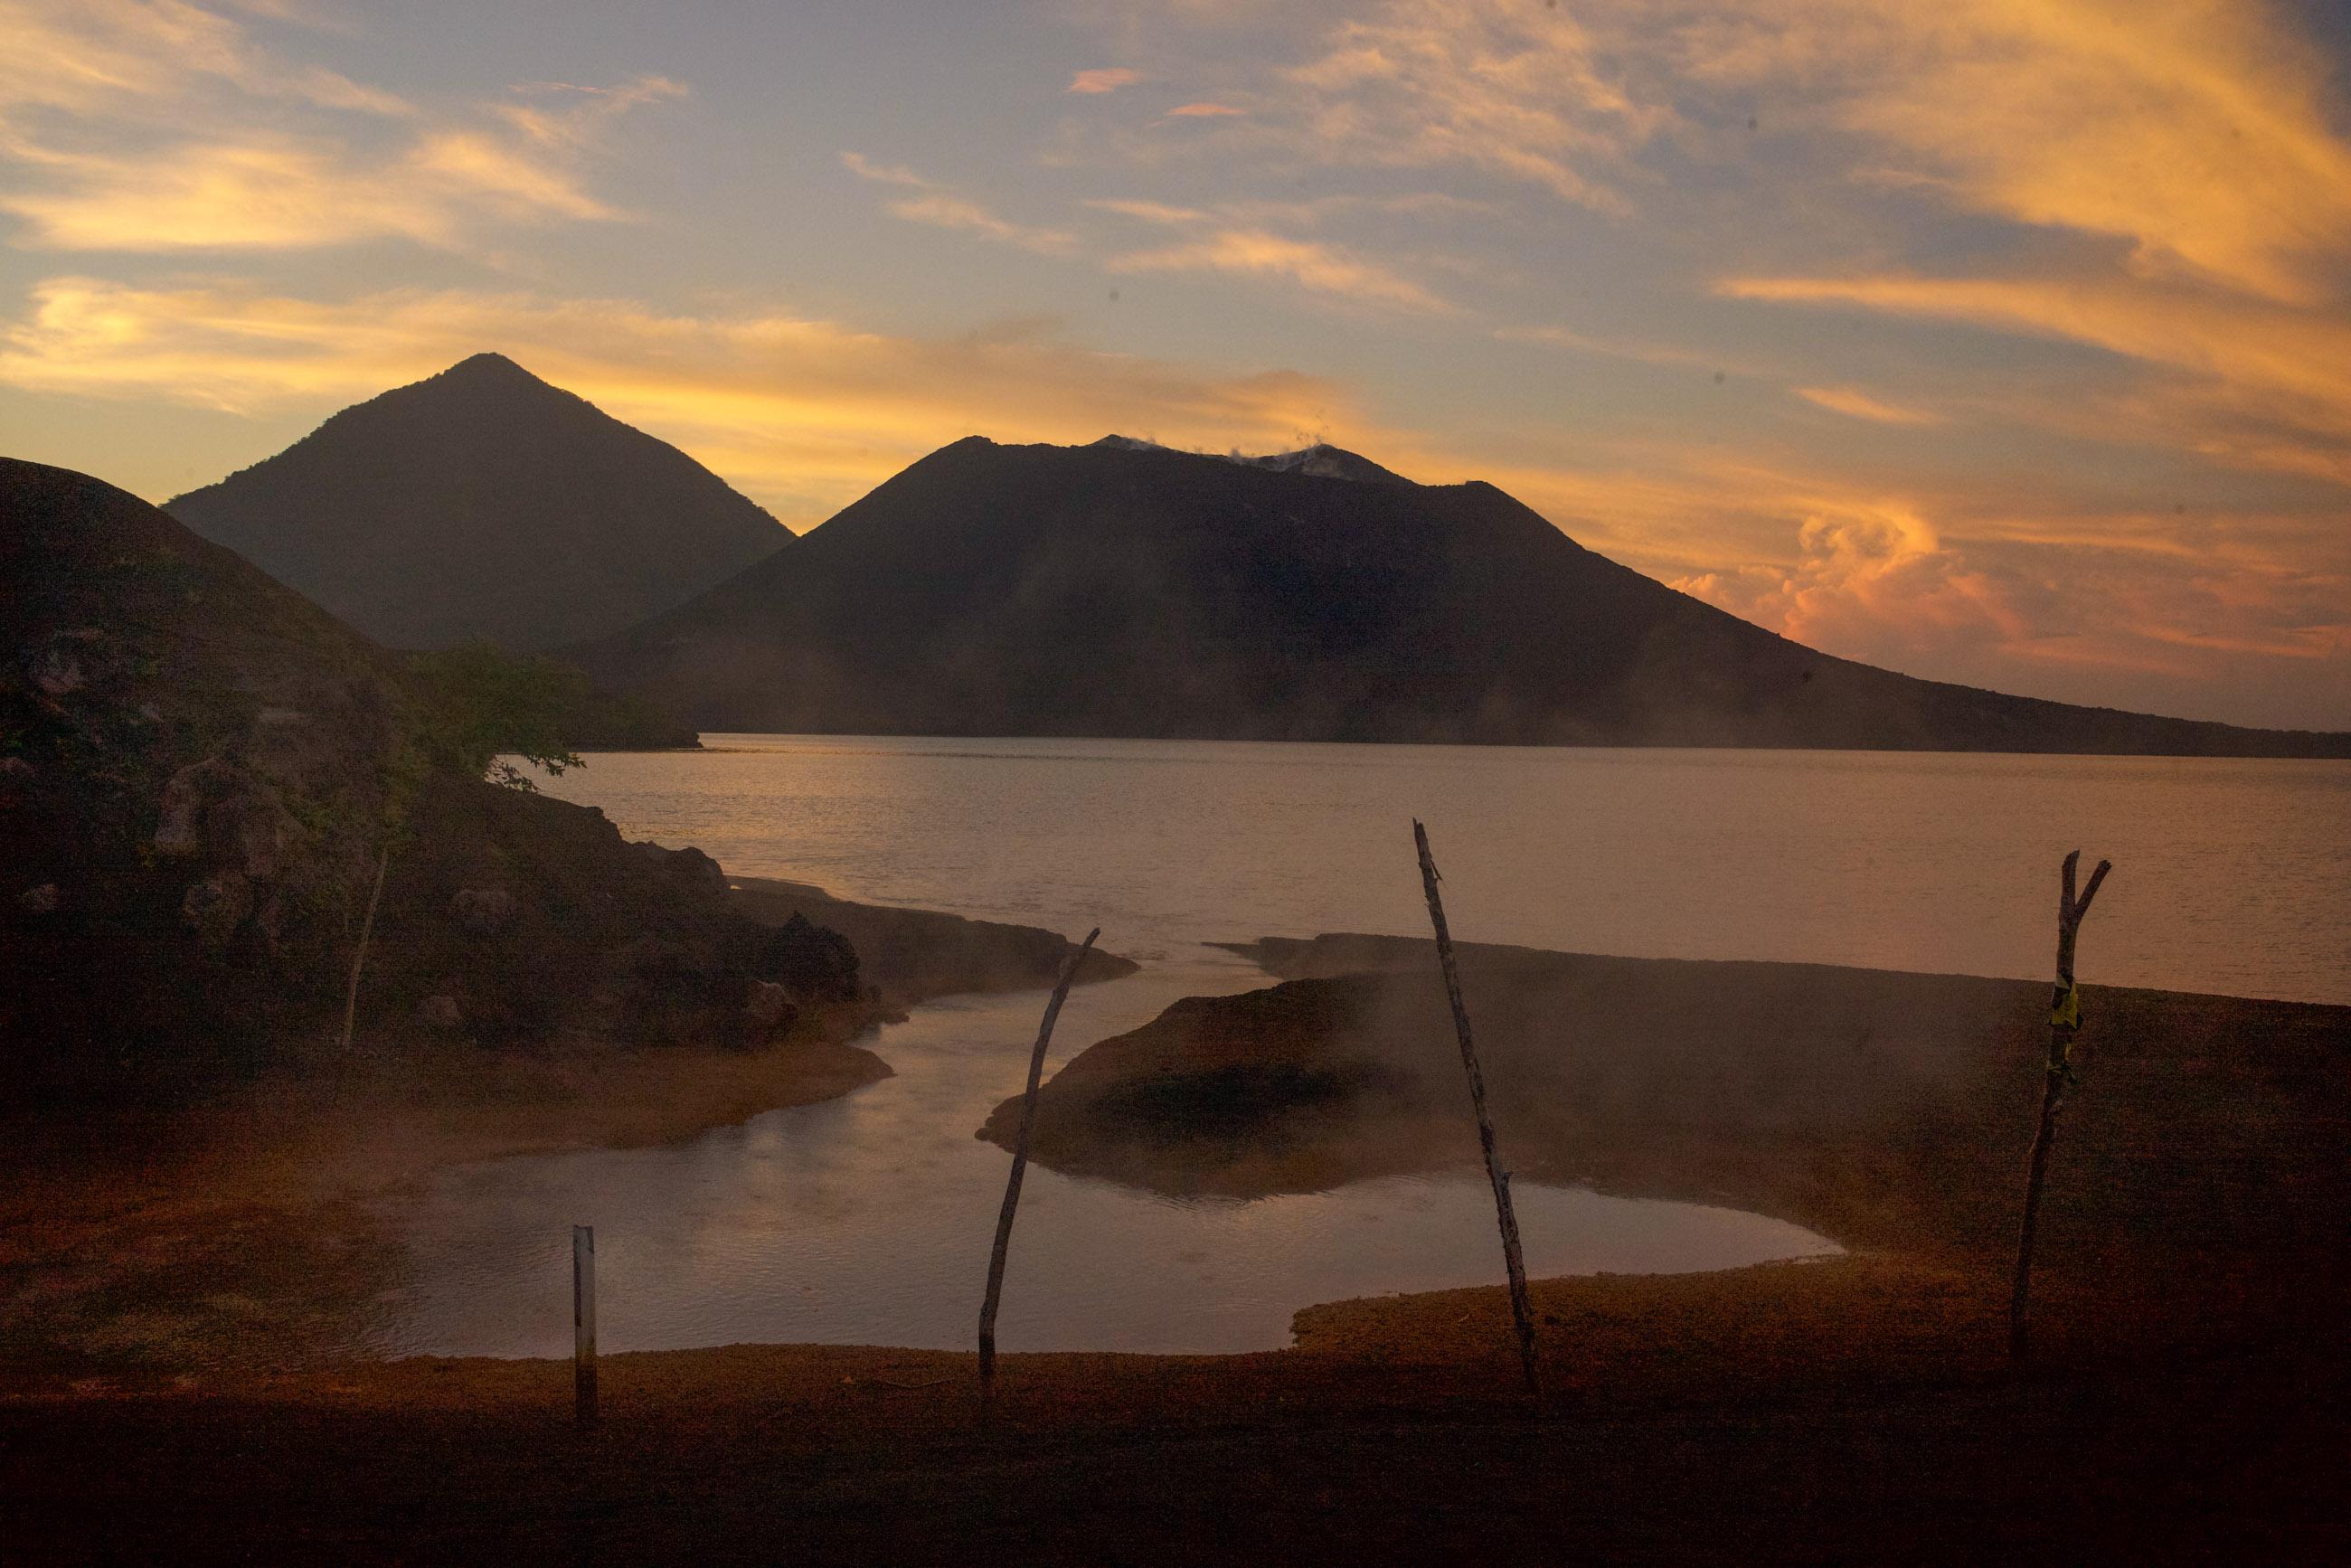 https://bubo.sk/uploads/galleries/7442/lubosfellner_papuanovaguinea_l1000788.jpg